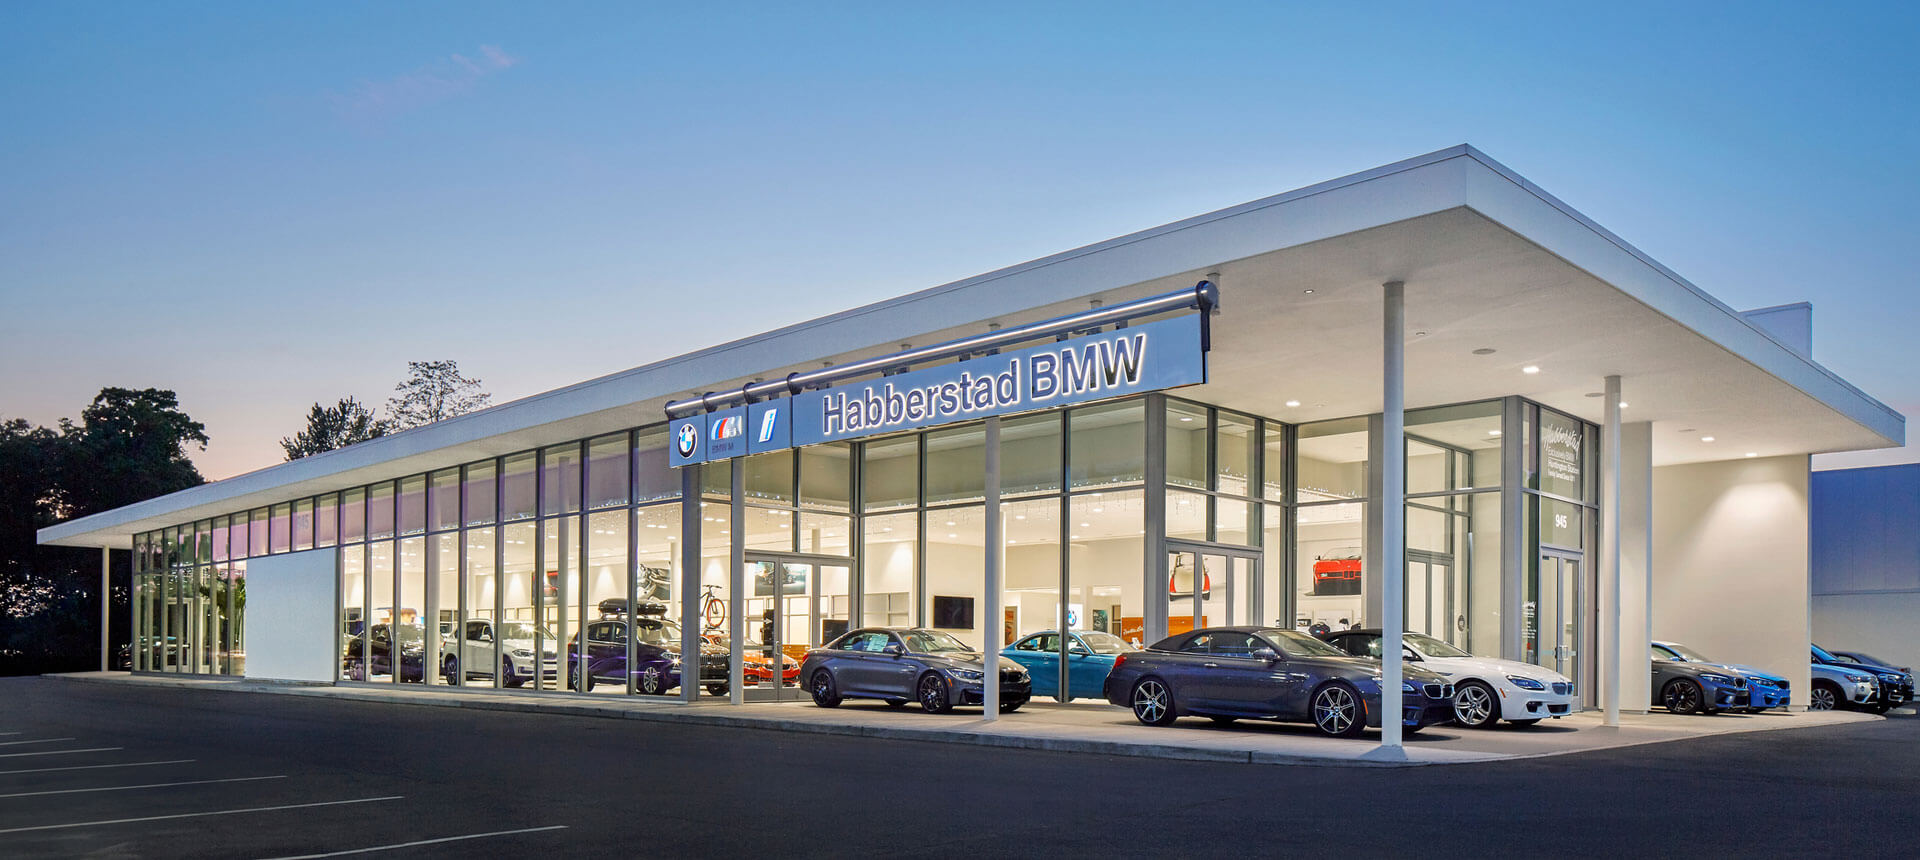 Habberstad BMW Huntington Station, New York Exterior